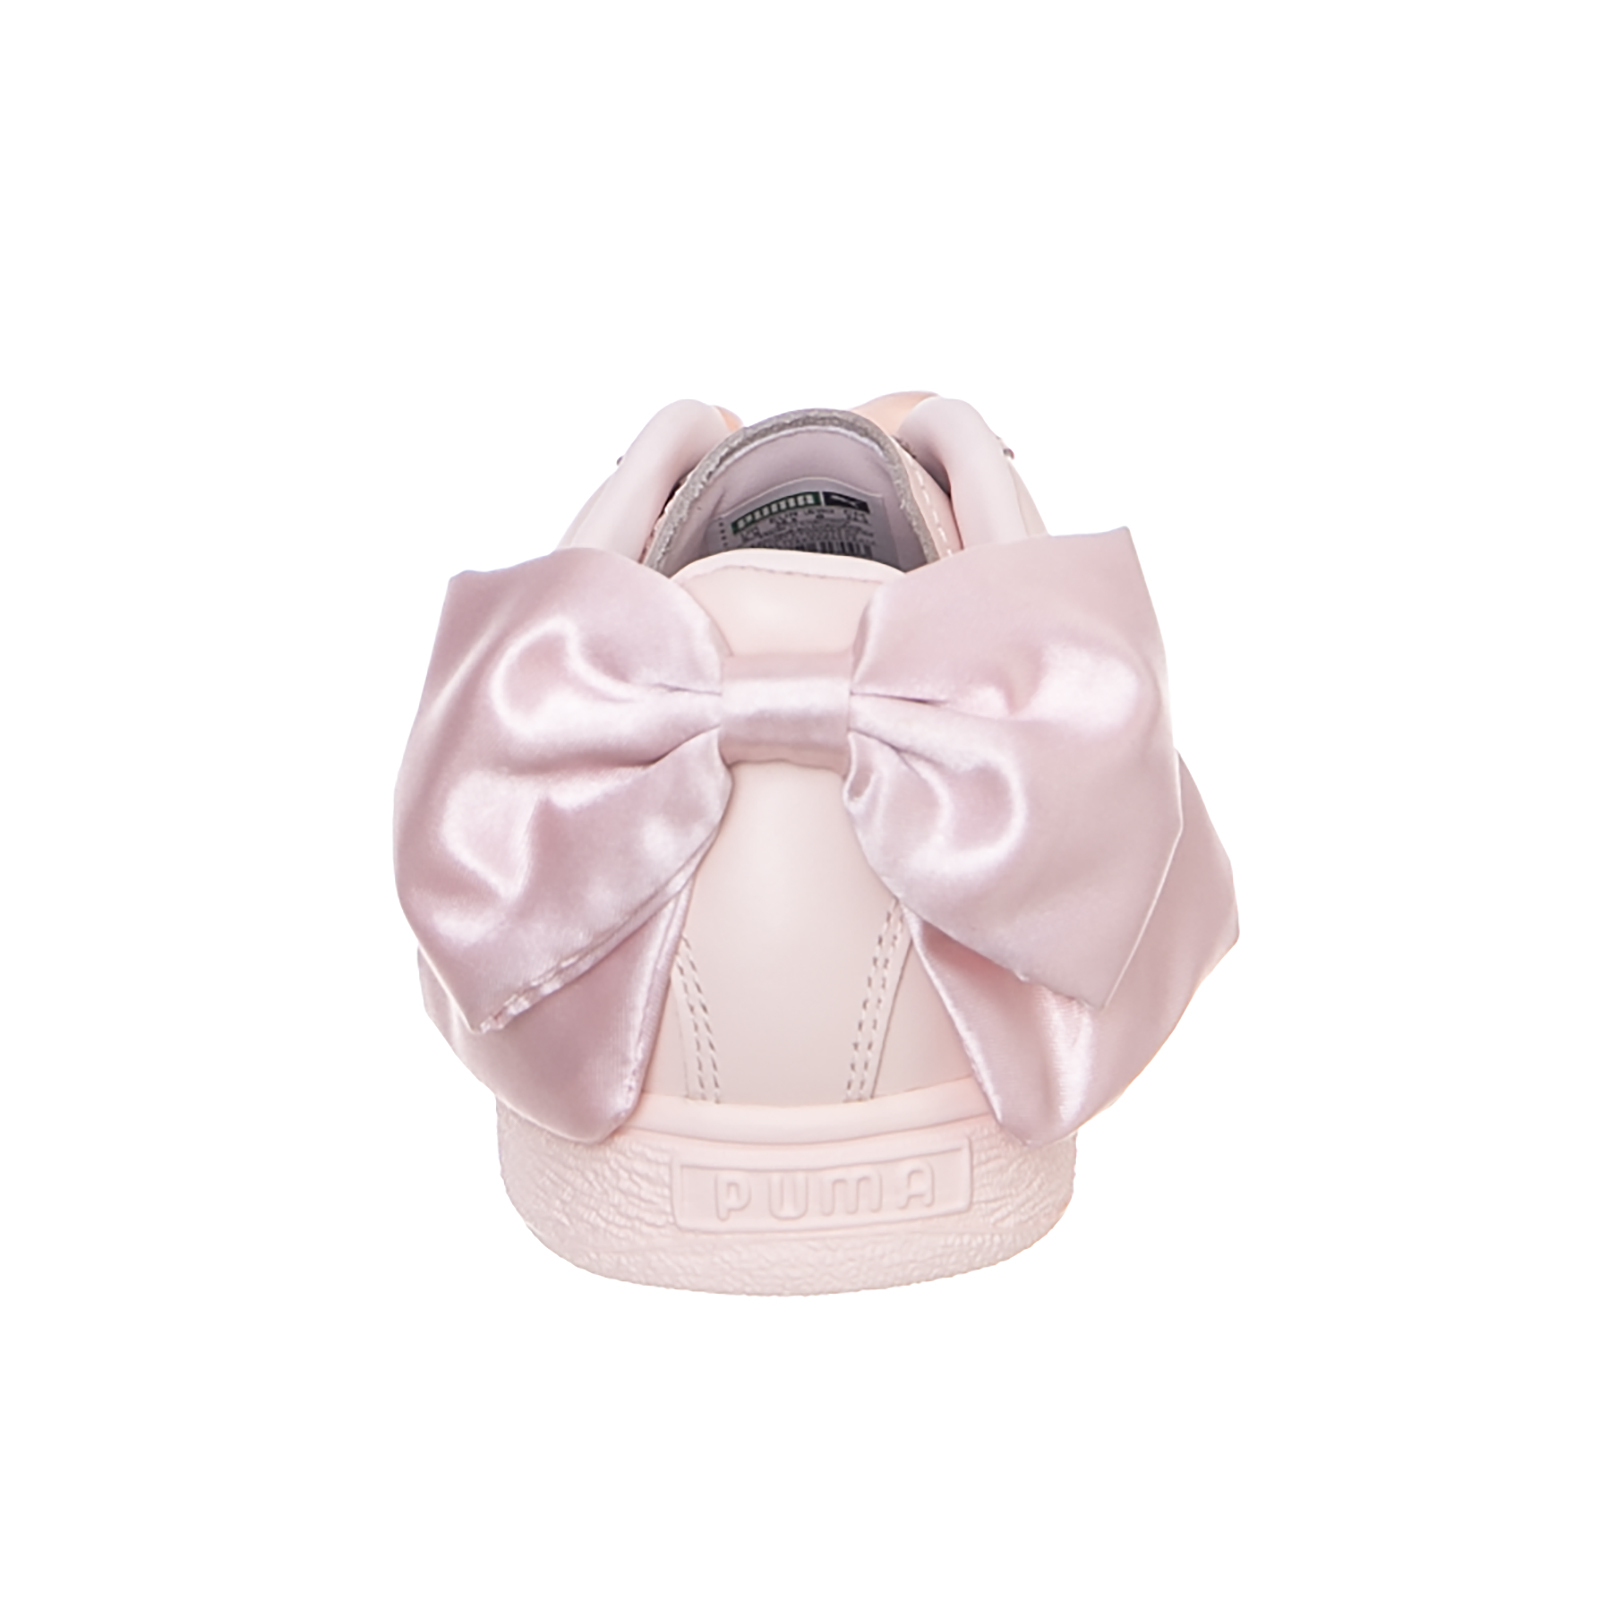 Puma Sneakers Basket Basket Basket Bow Wn S Pearl-Pearl Pink 0aa2a2